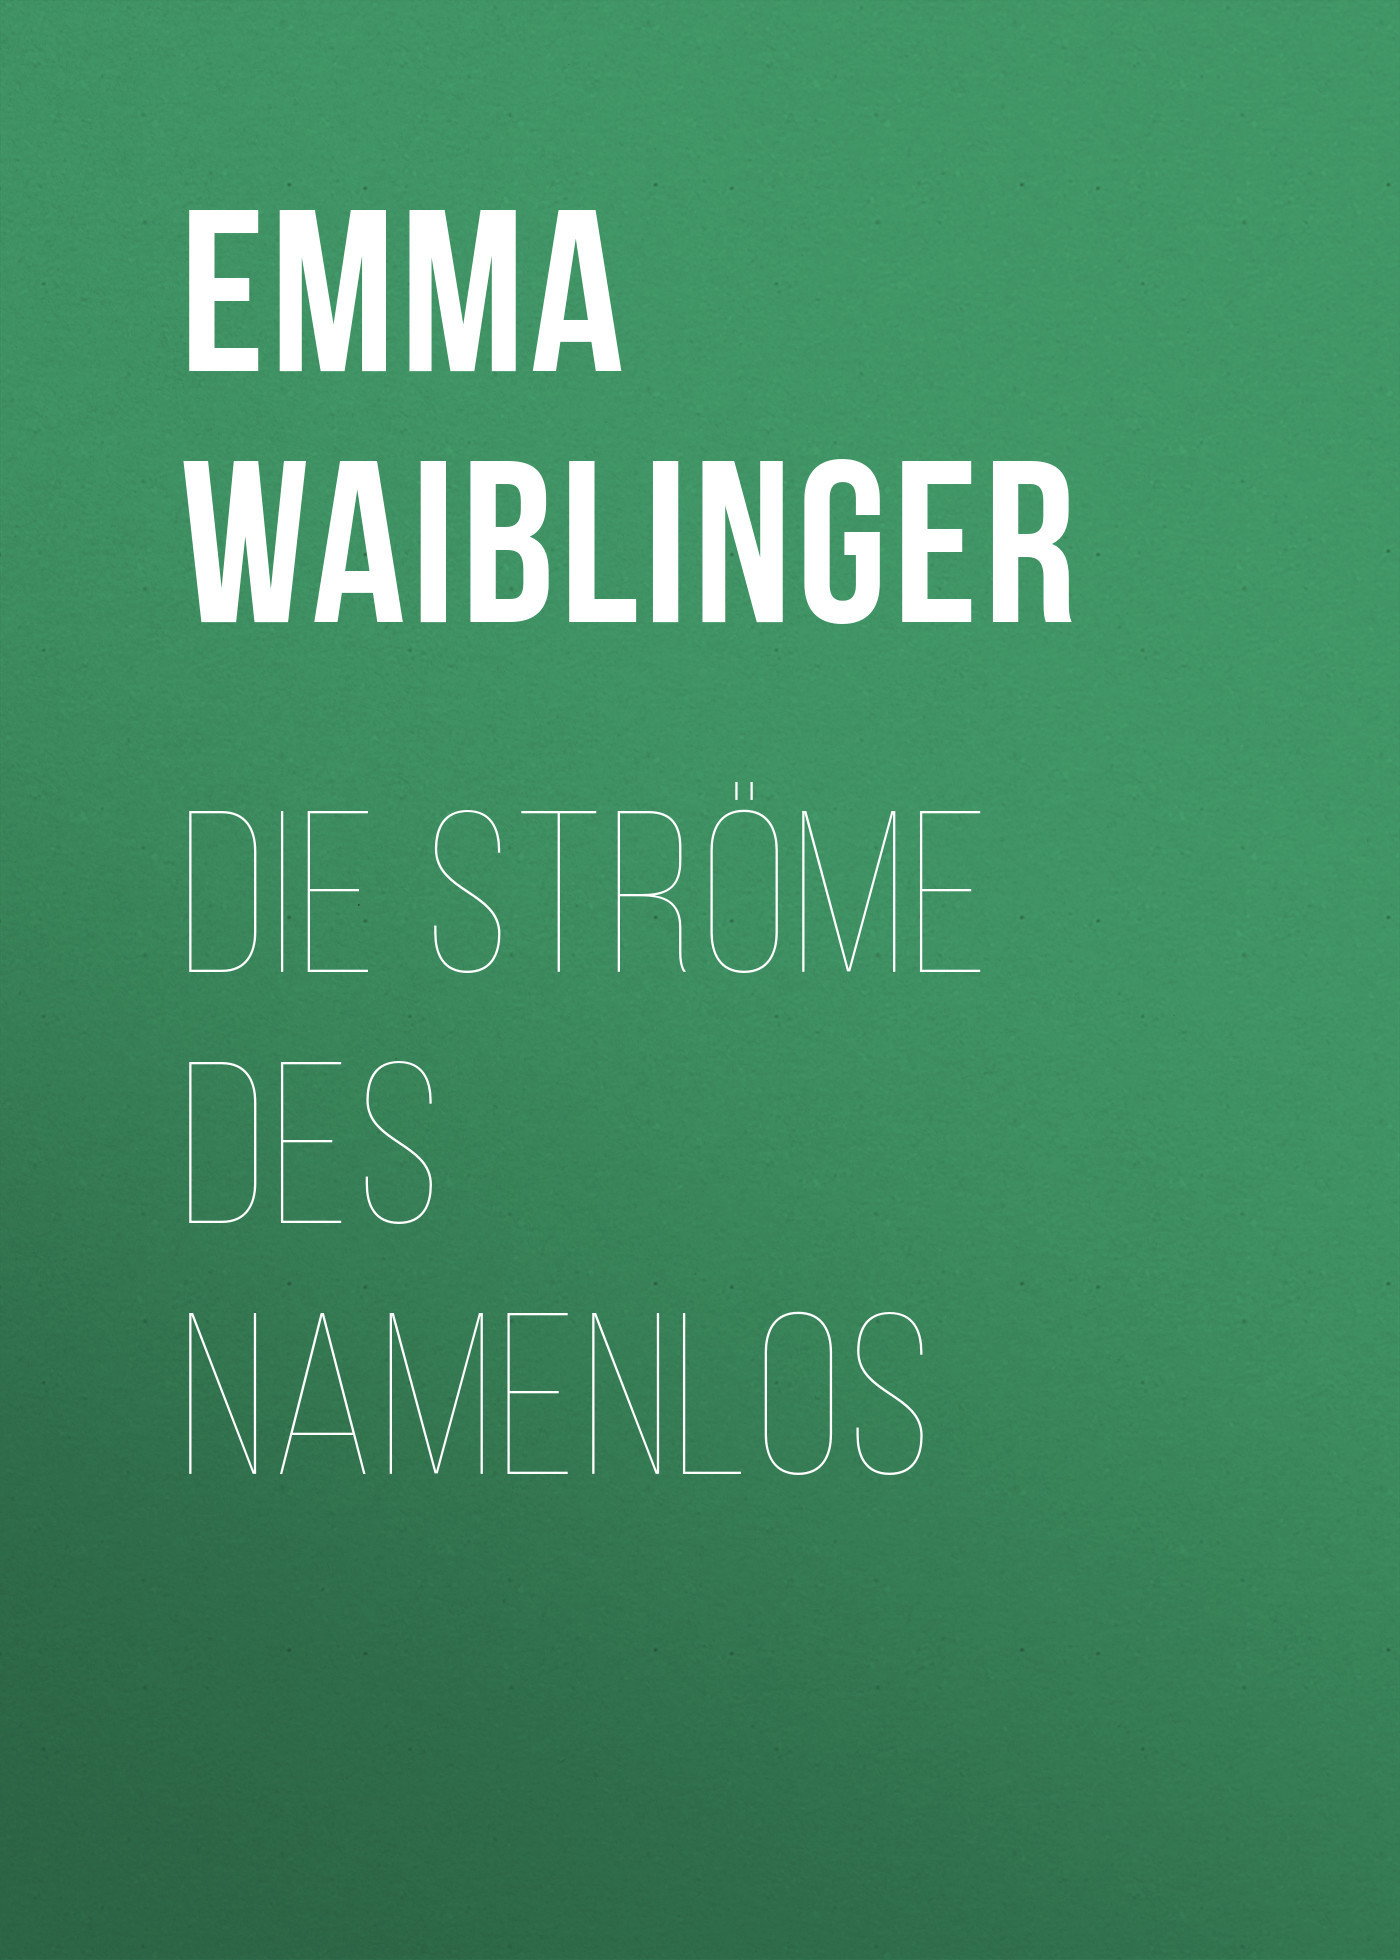 Emma Waiblinger Die Ströme des Namenlos красное боди emma xxl 3xl